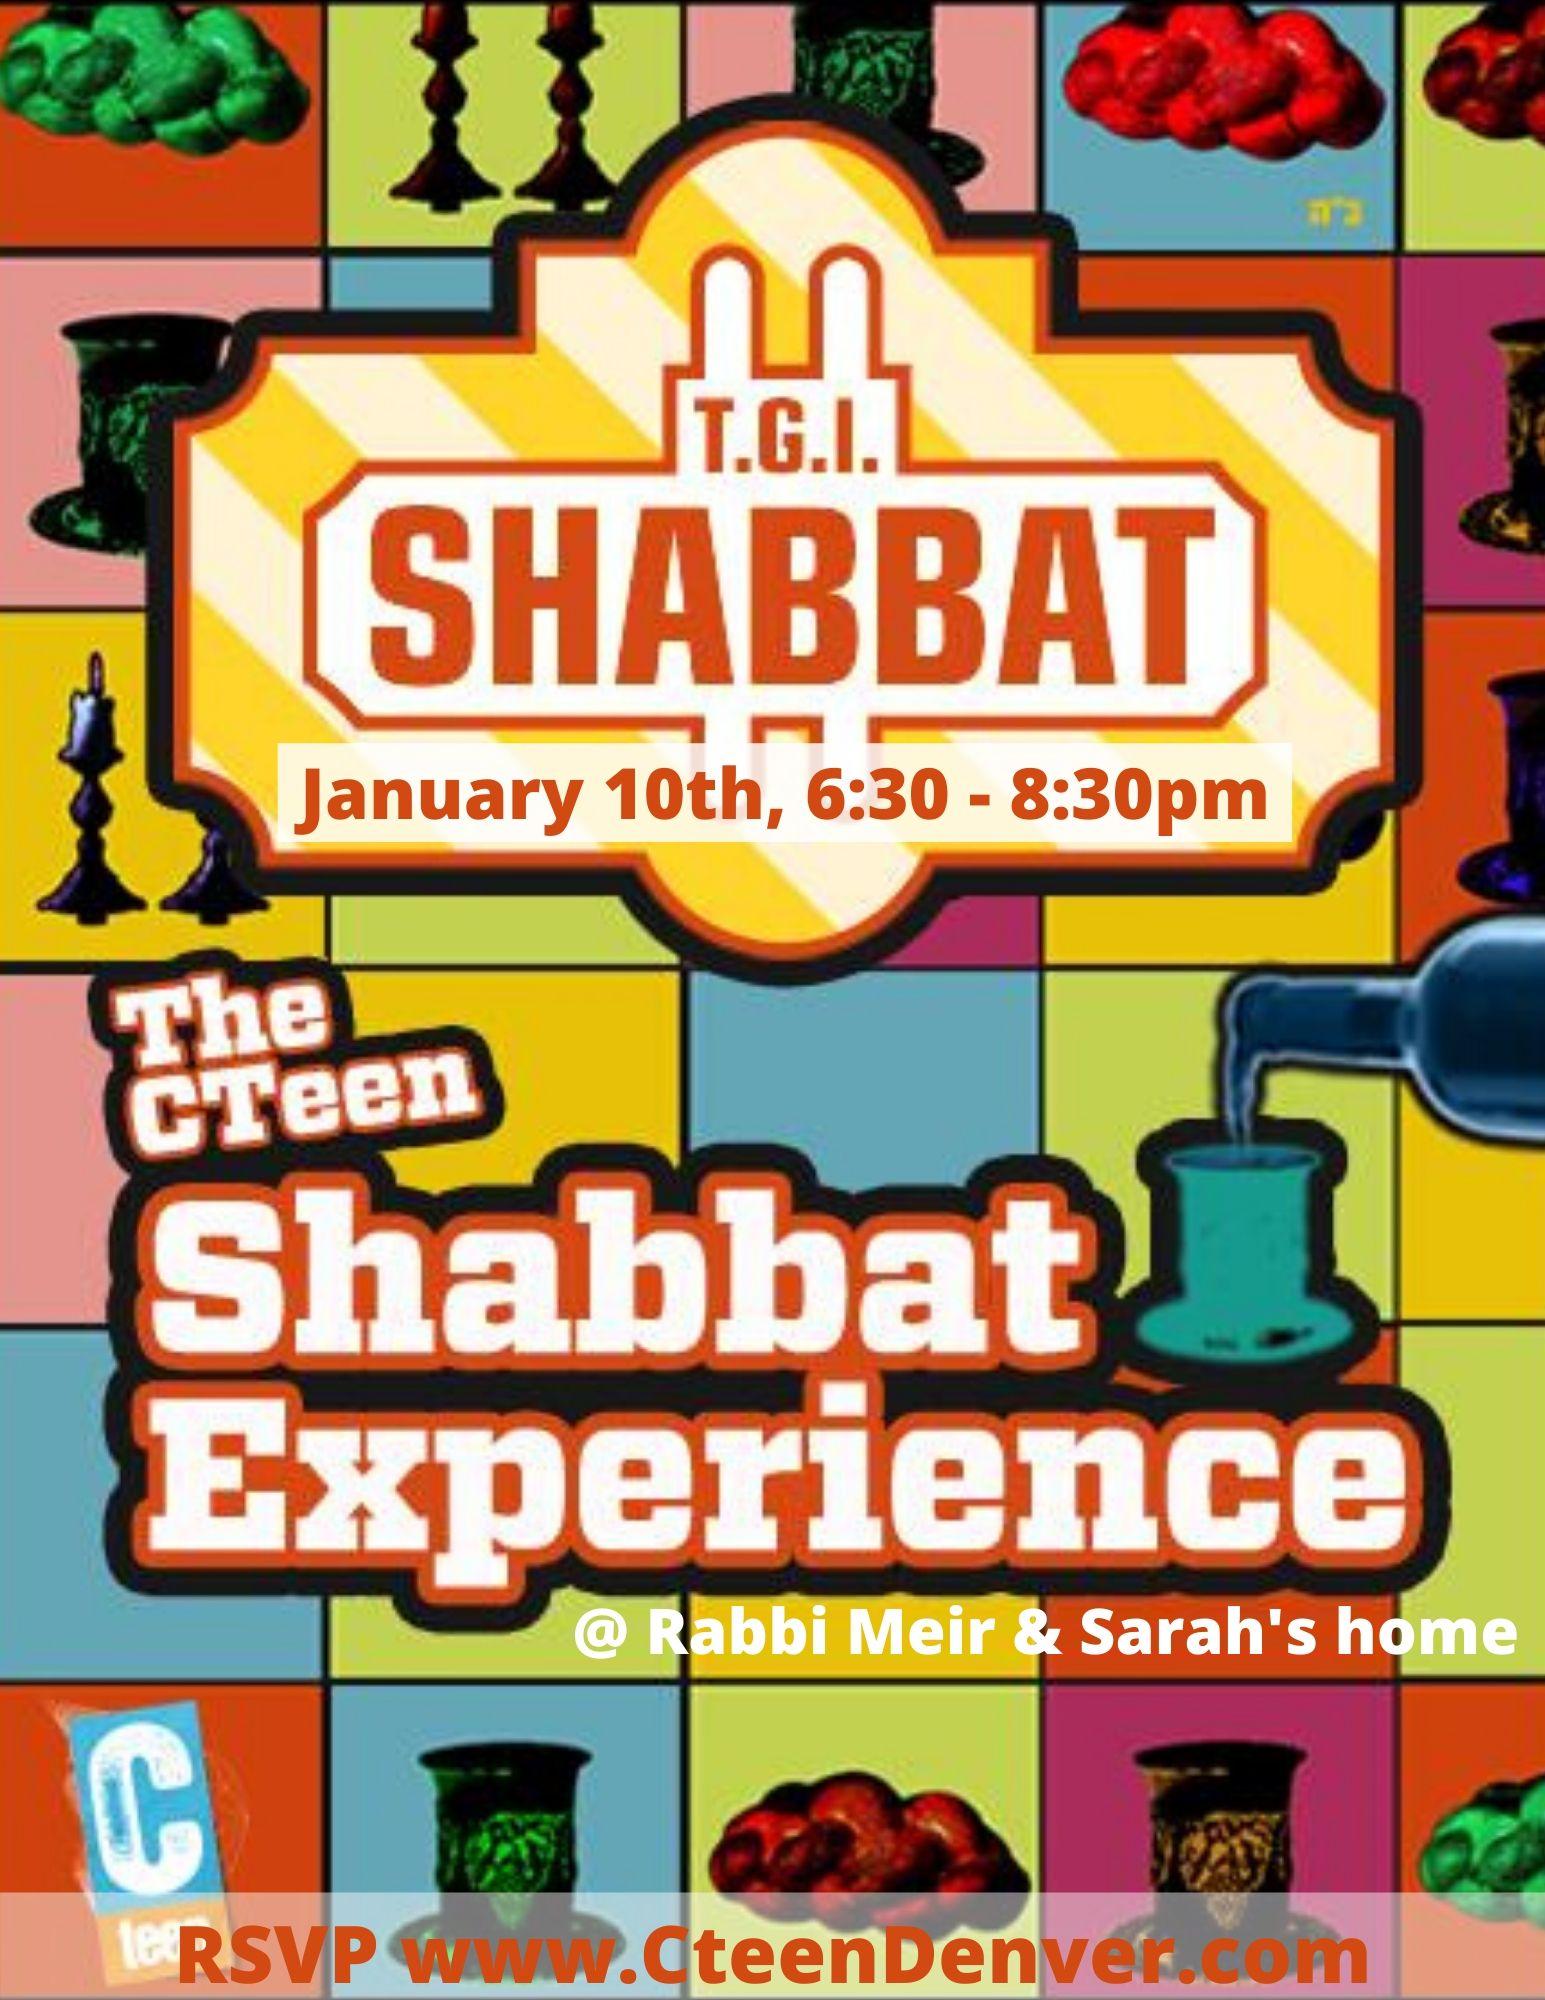 @ Rabbi Meir & Sarah's home.jpg